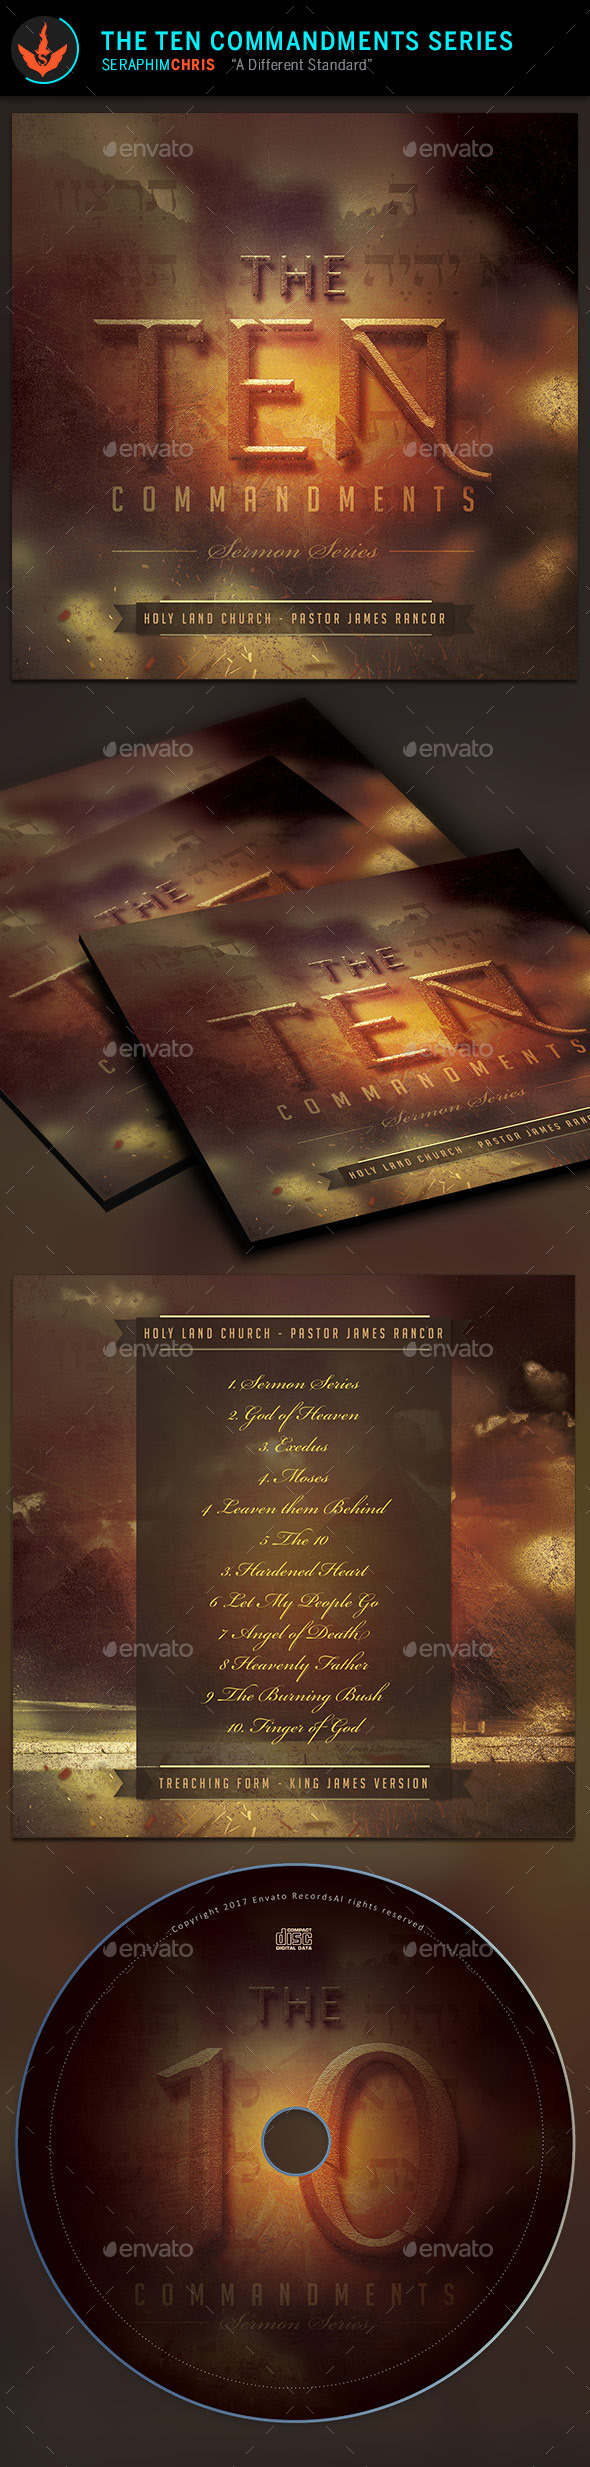 10 Commandments Series: CD Artwork Template - CD & DVD Artwork Print Templates